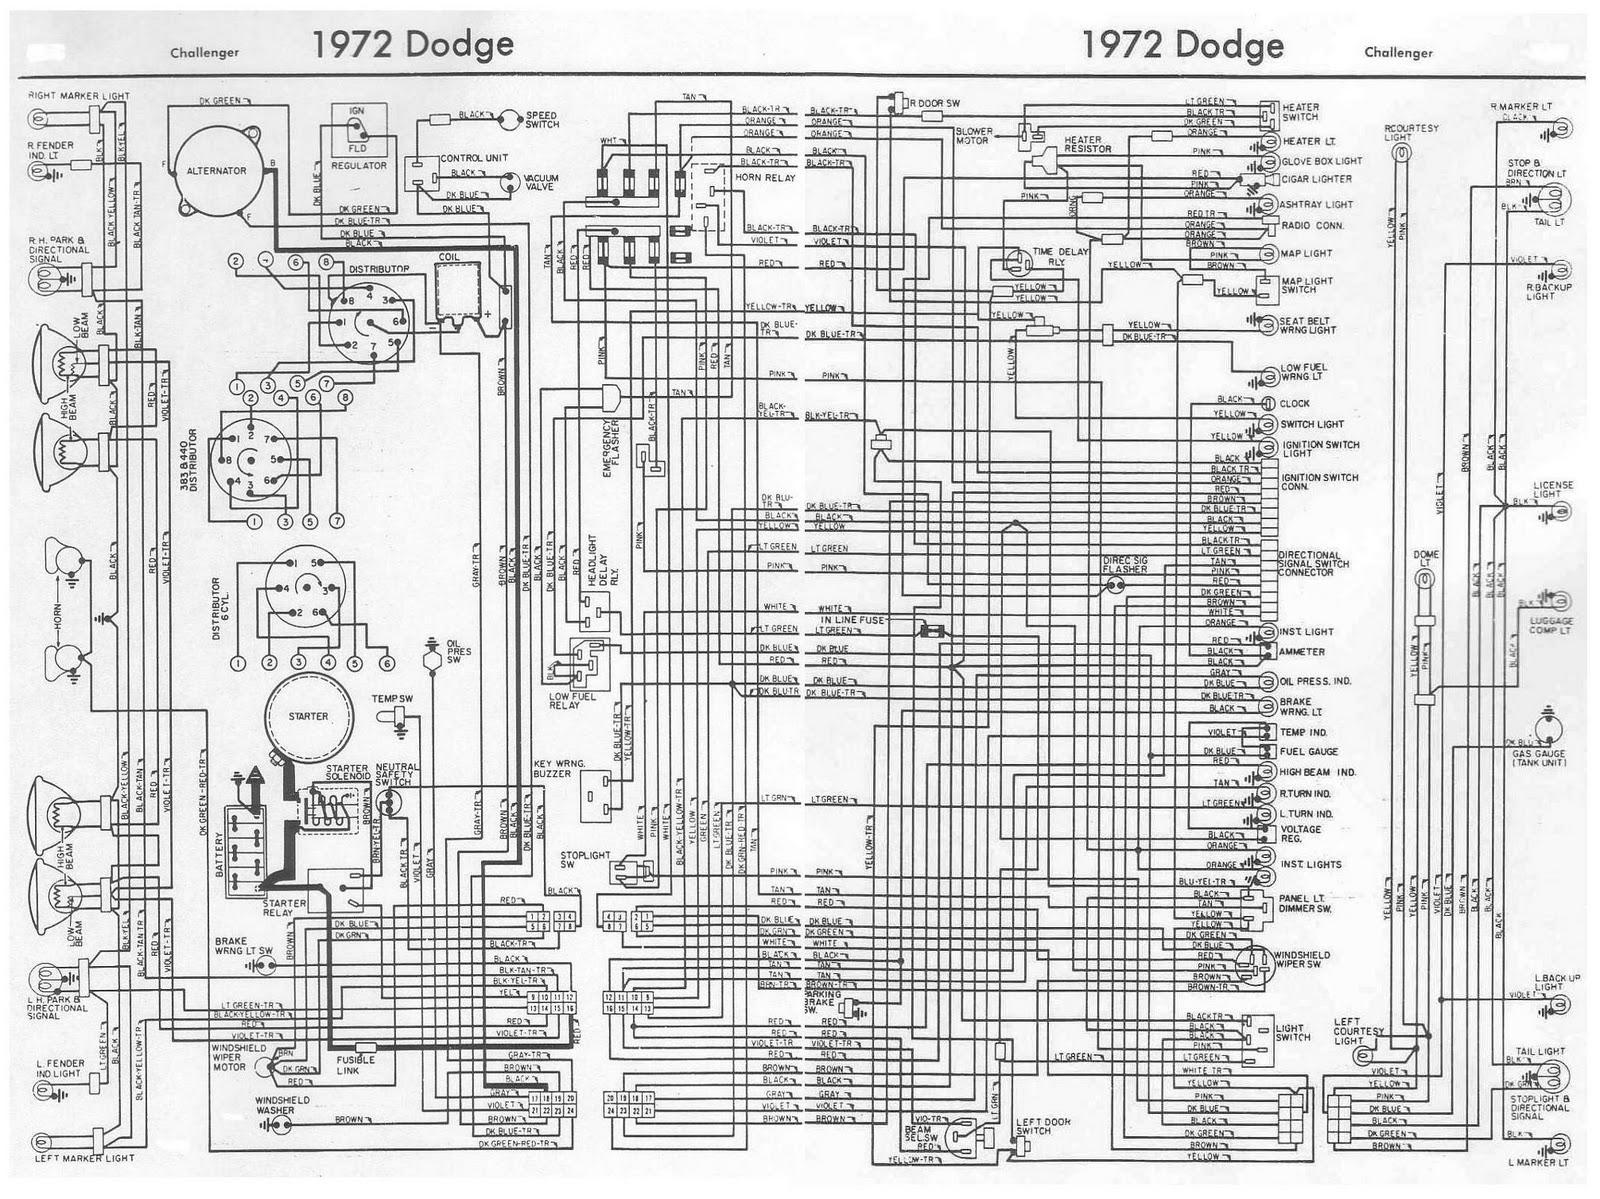 ford 6700 wiring diagram - 1999 suburban wiring schematic - ace-wiring .ati-loro.jeanjaures37.fr  wiring diagram resource